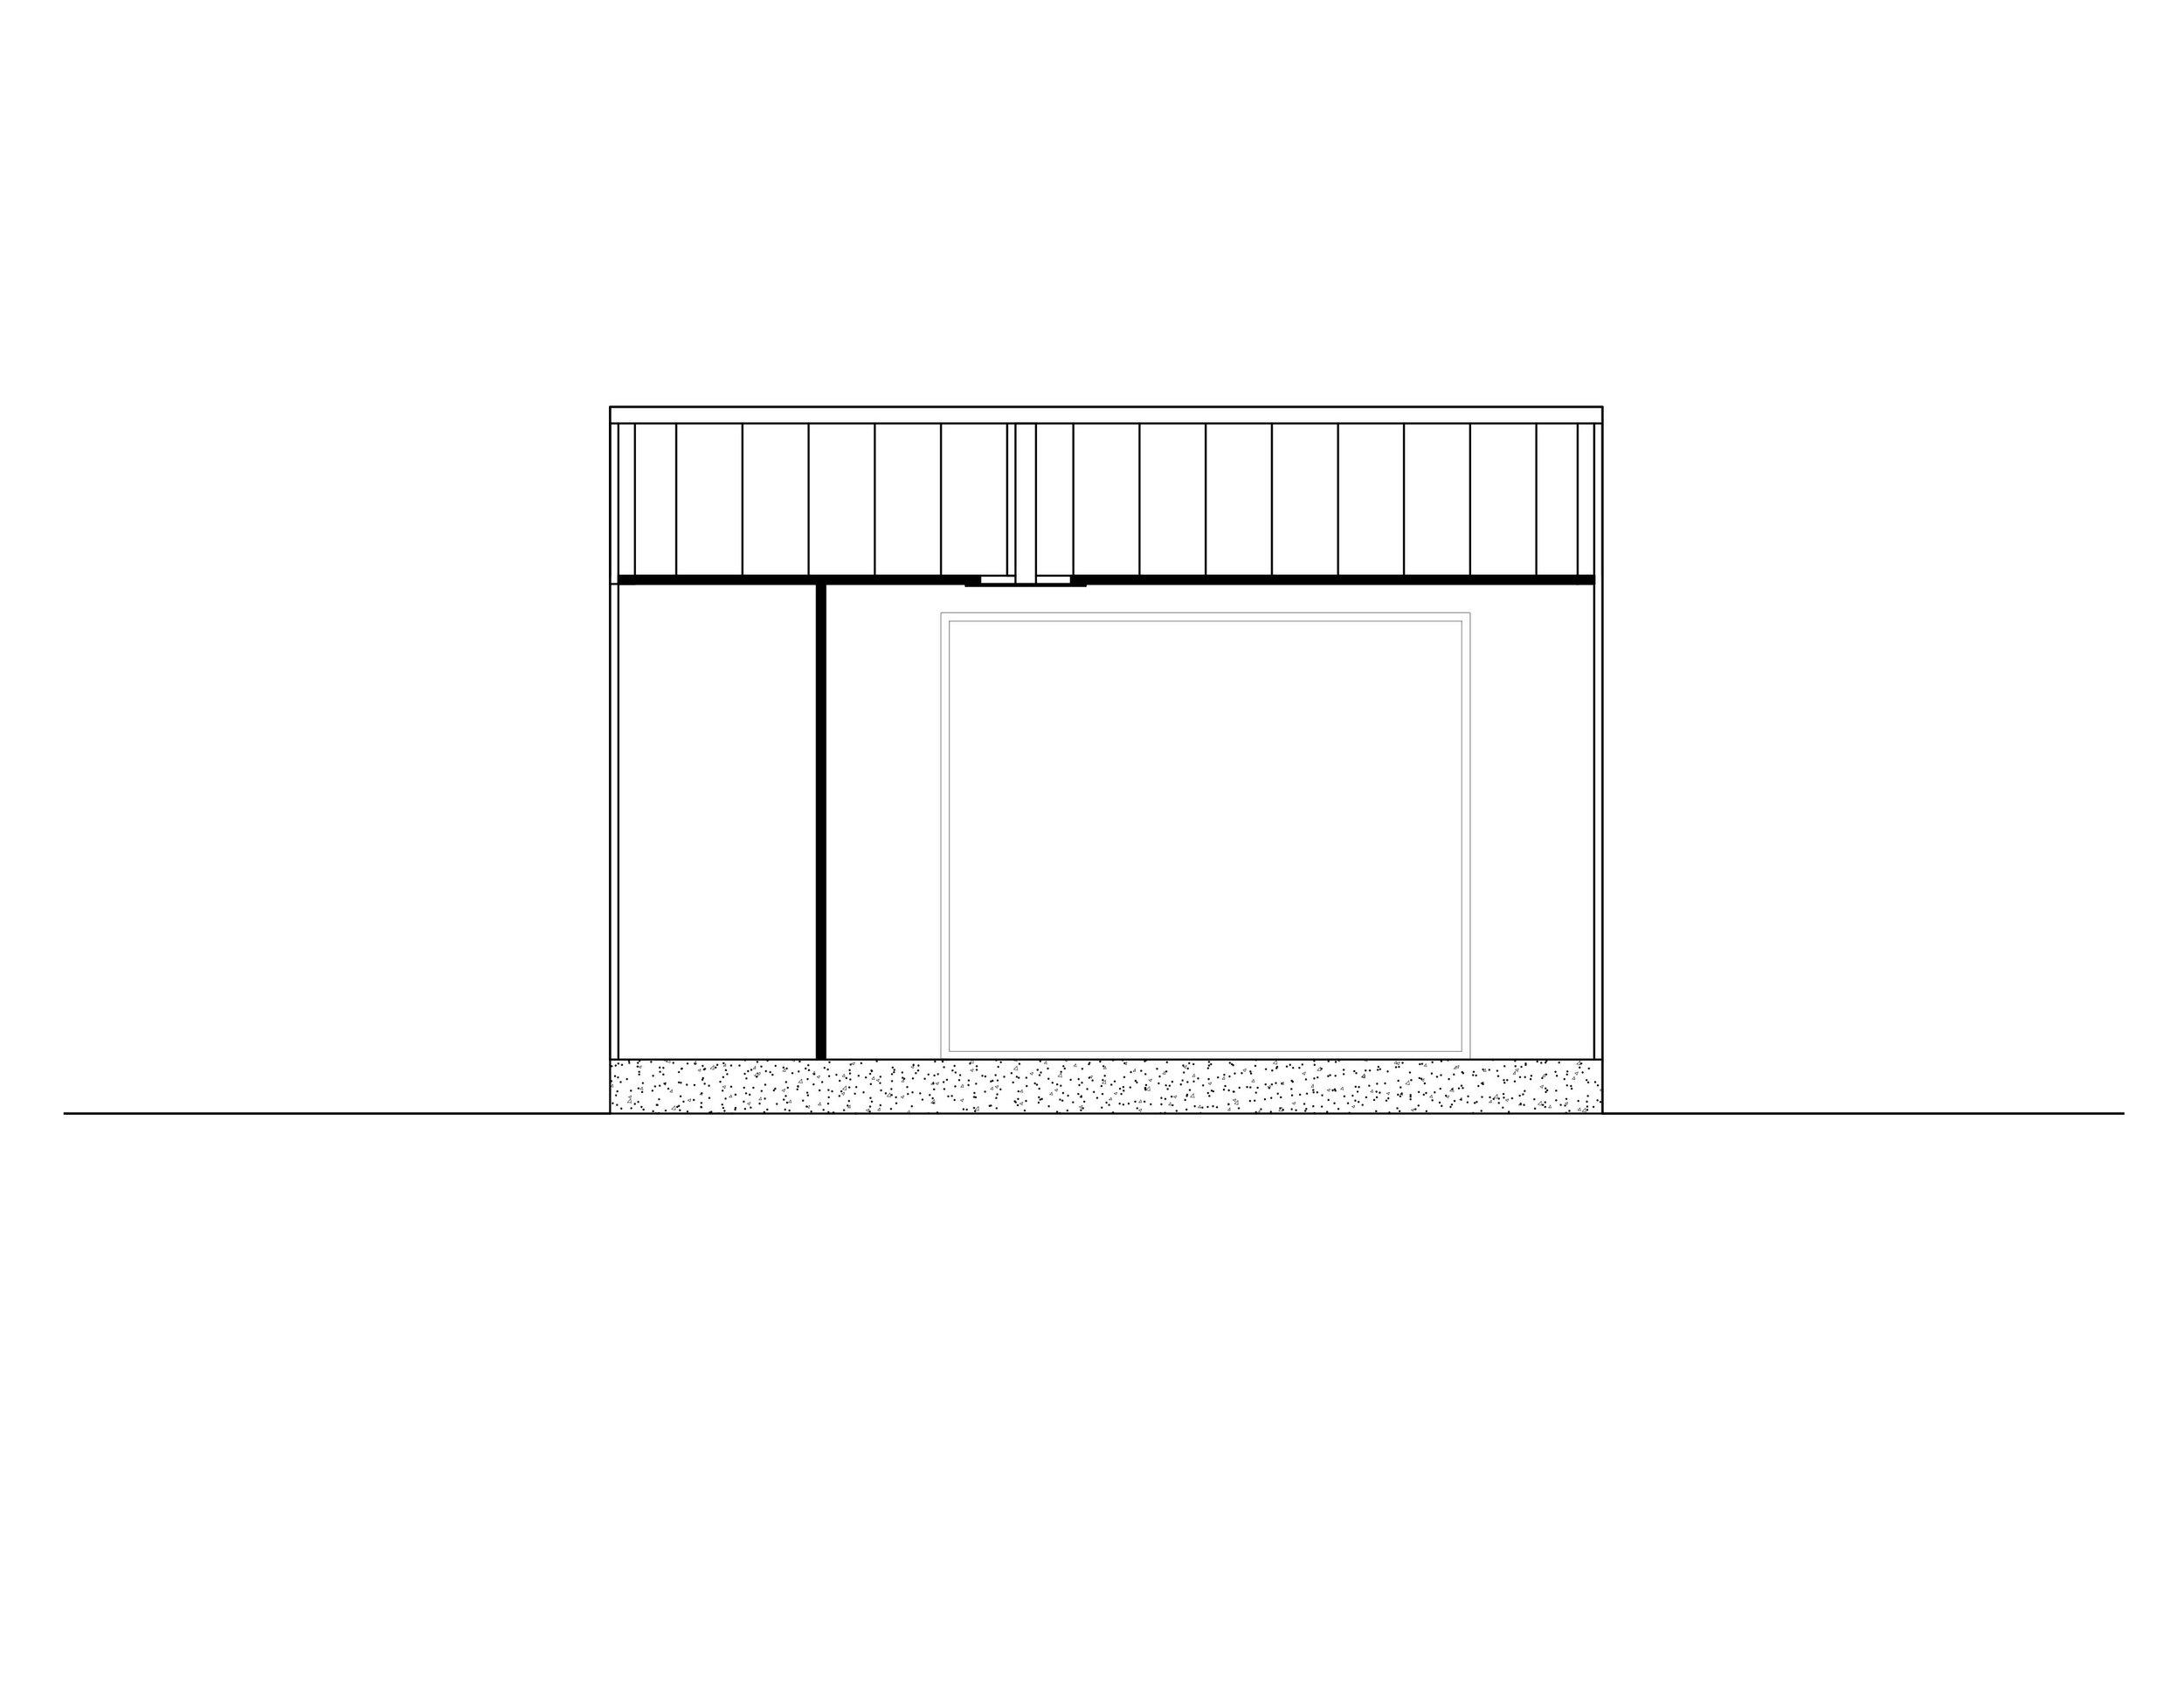 Building 9 Section C